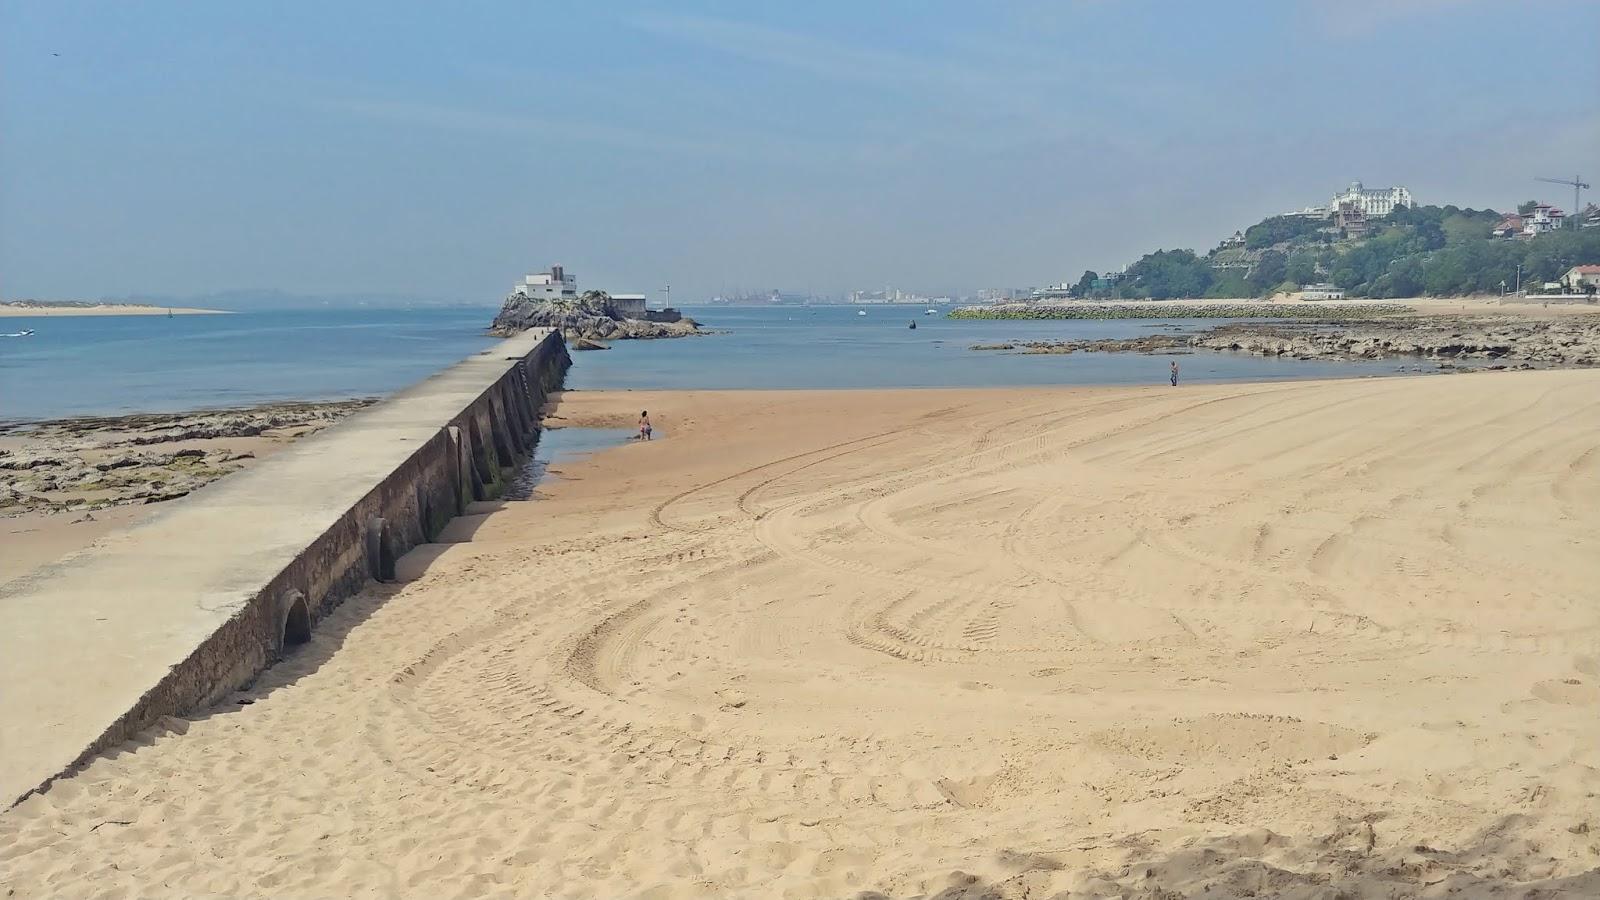 Playa de Los Bikinis plaże w Santander